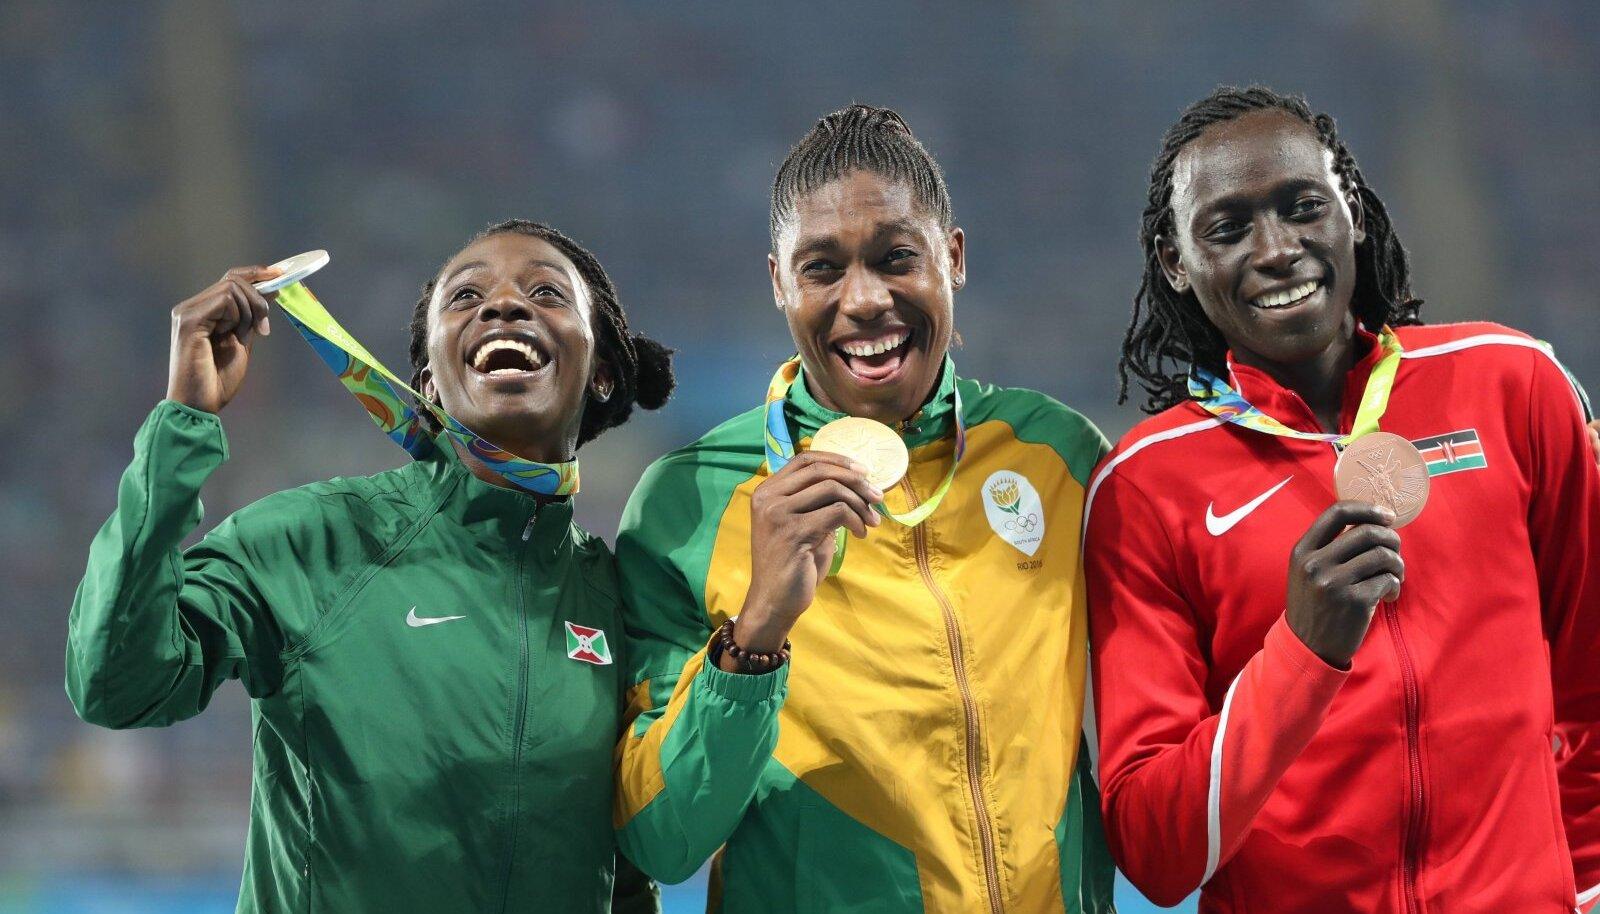 Vasakult: Francine Niyonsaba, Caster Semenya, Margaret Nyairera Wambui